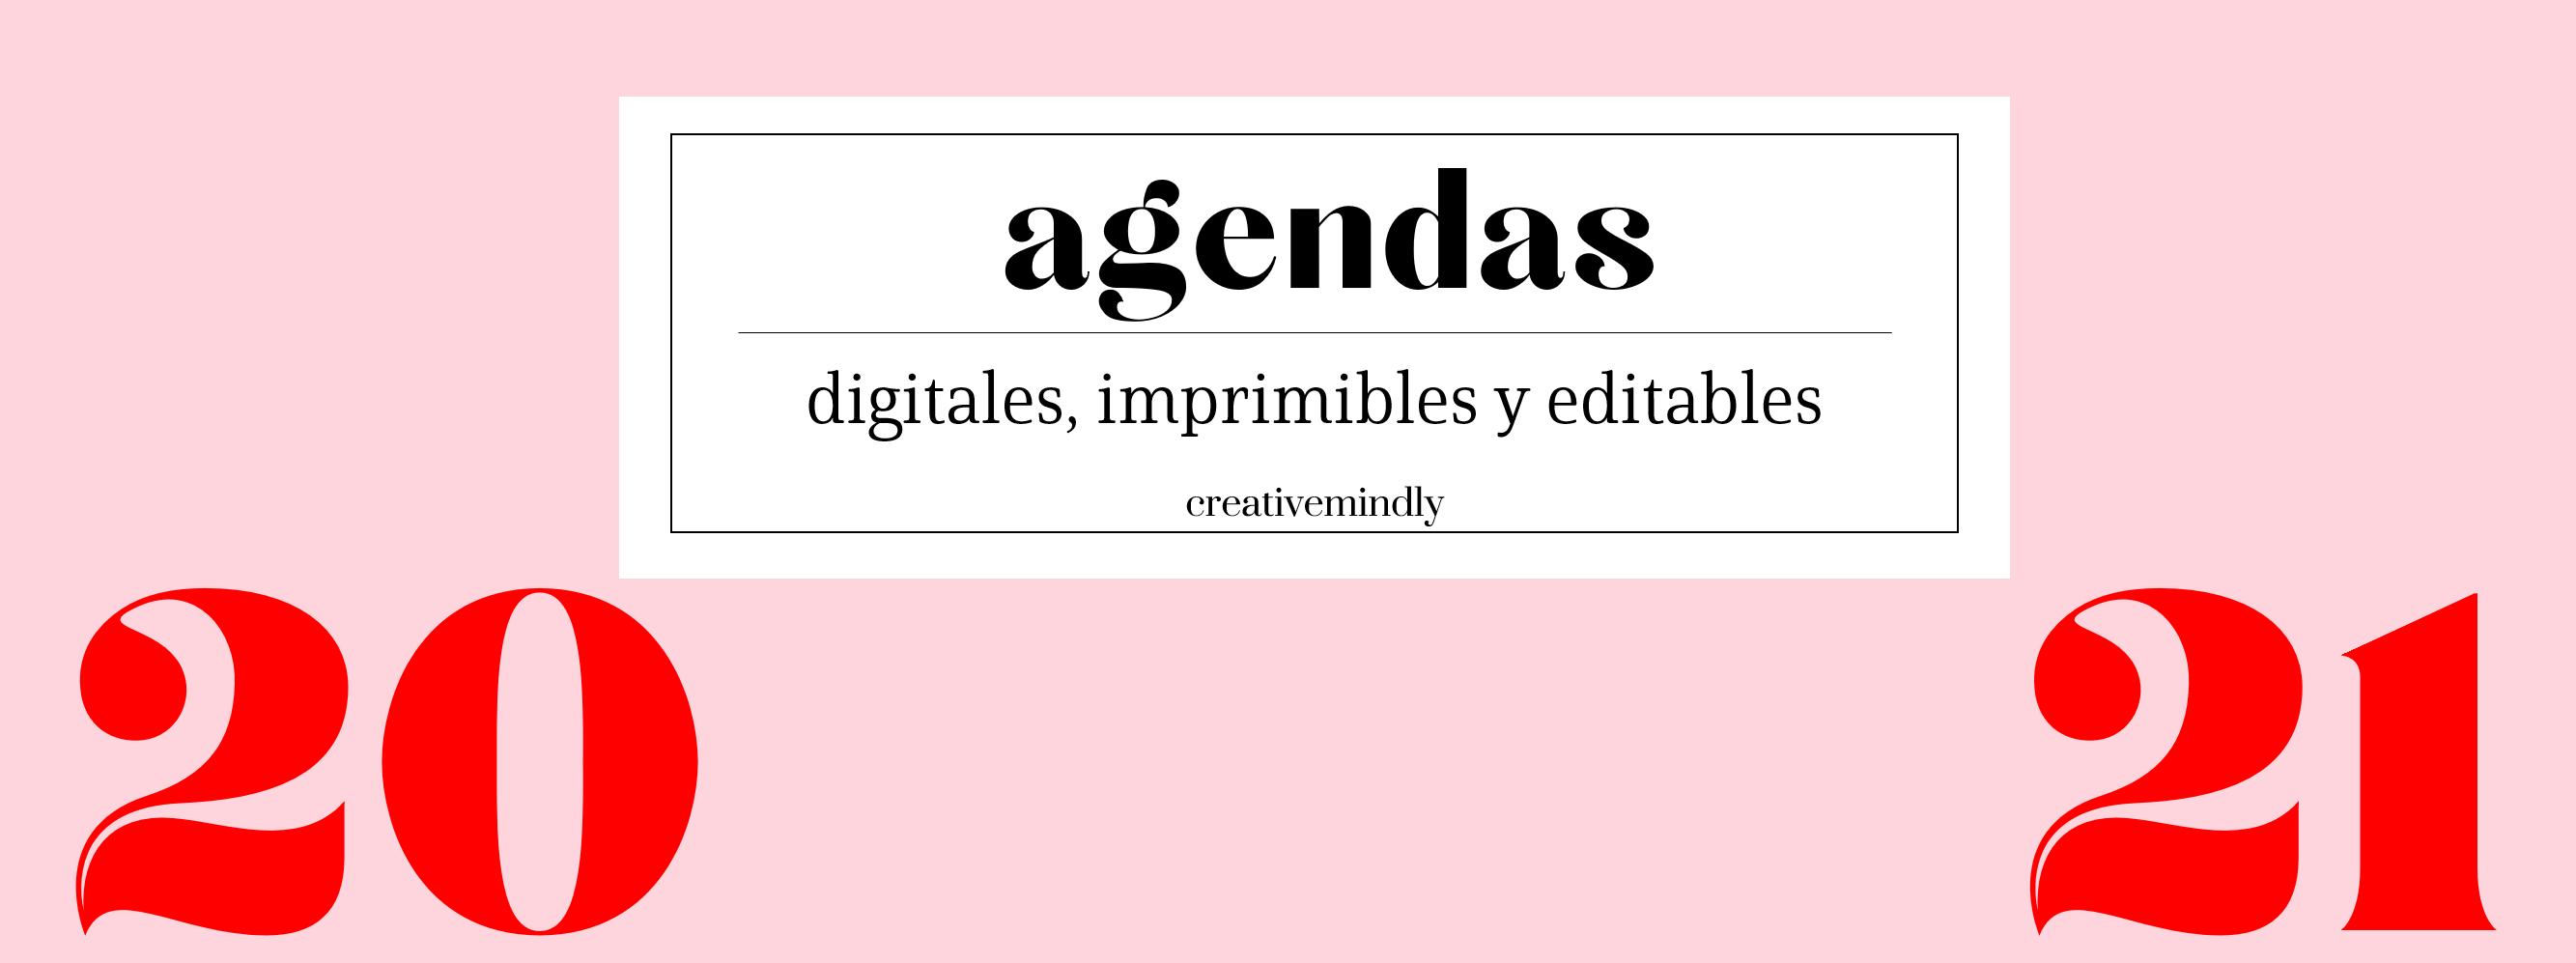 Agenda digital editable imprimible 2021